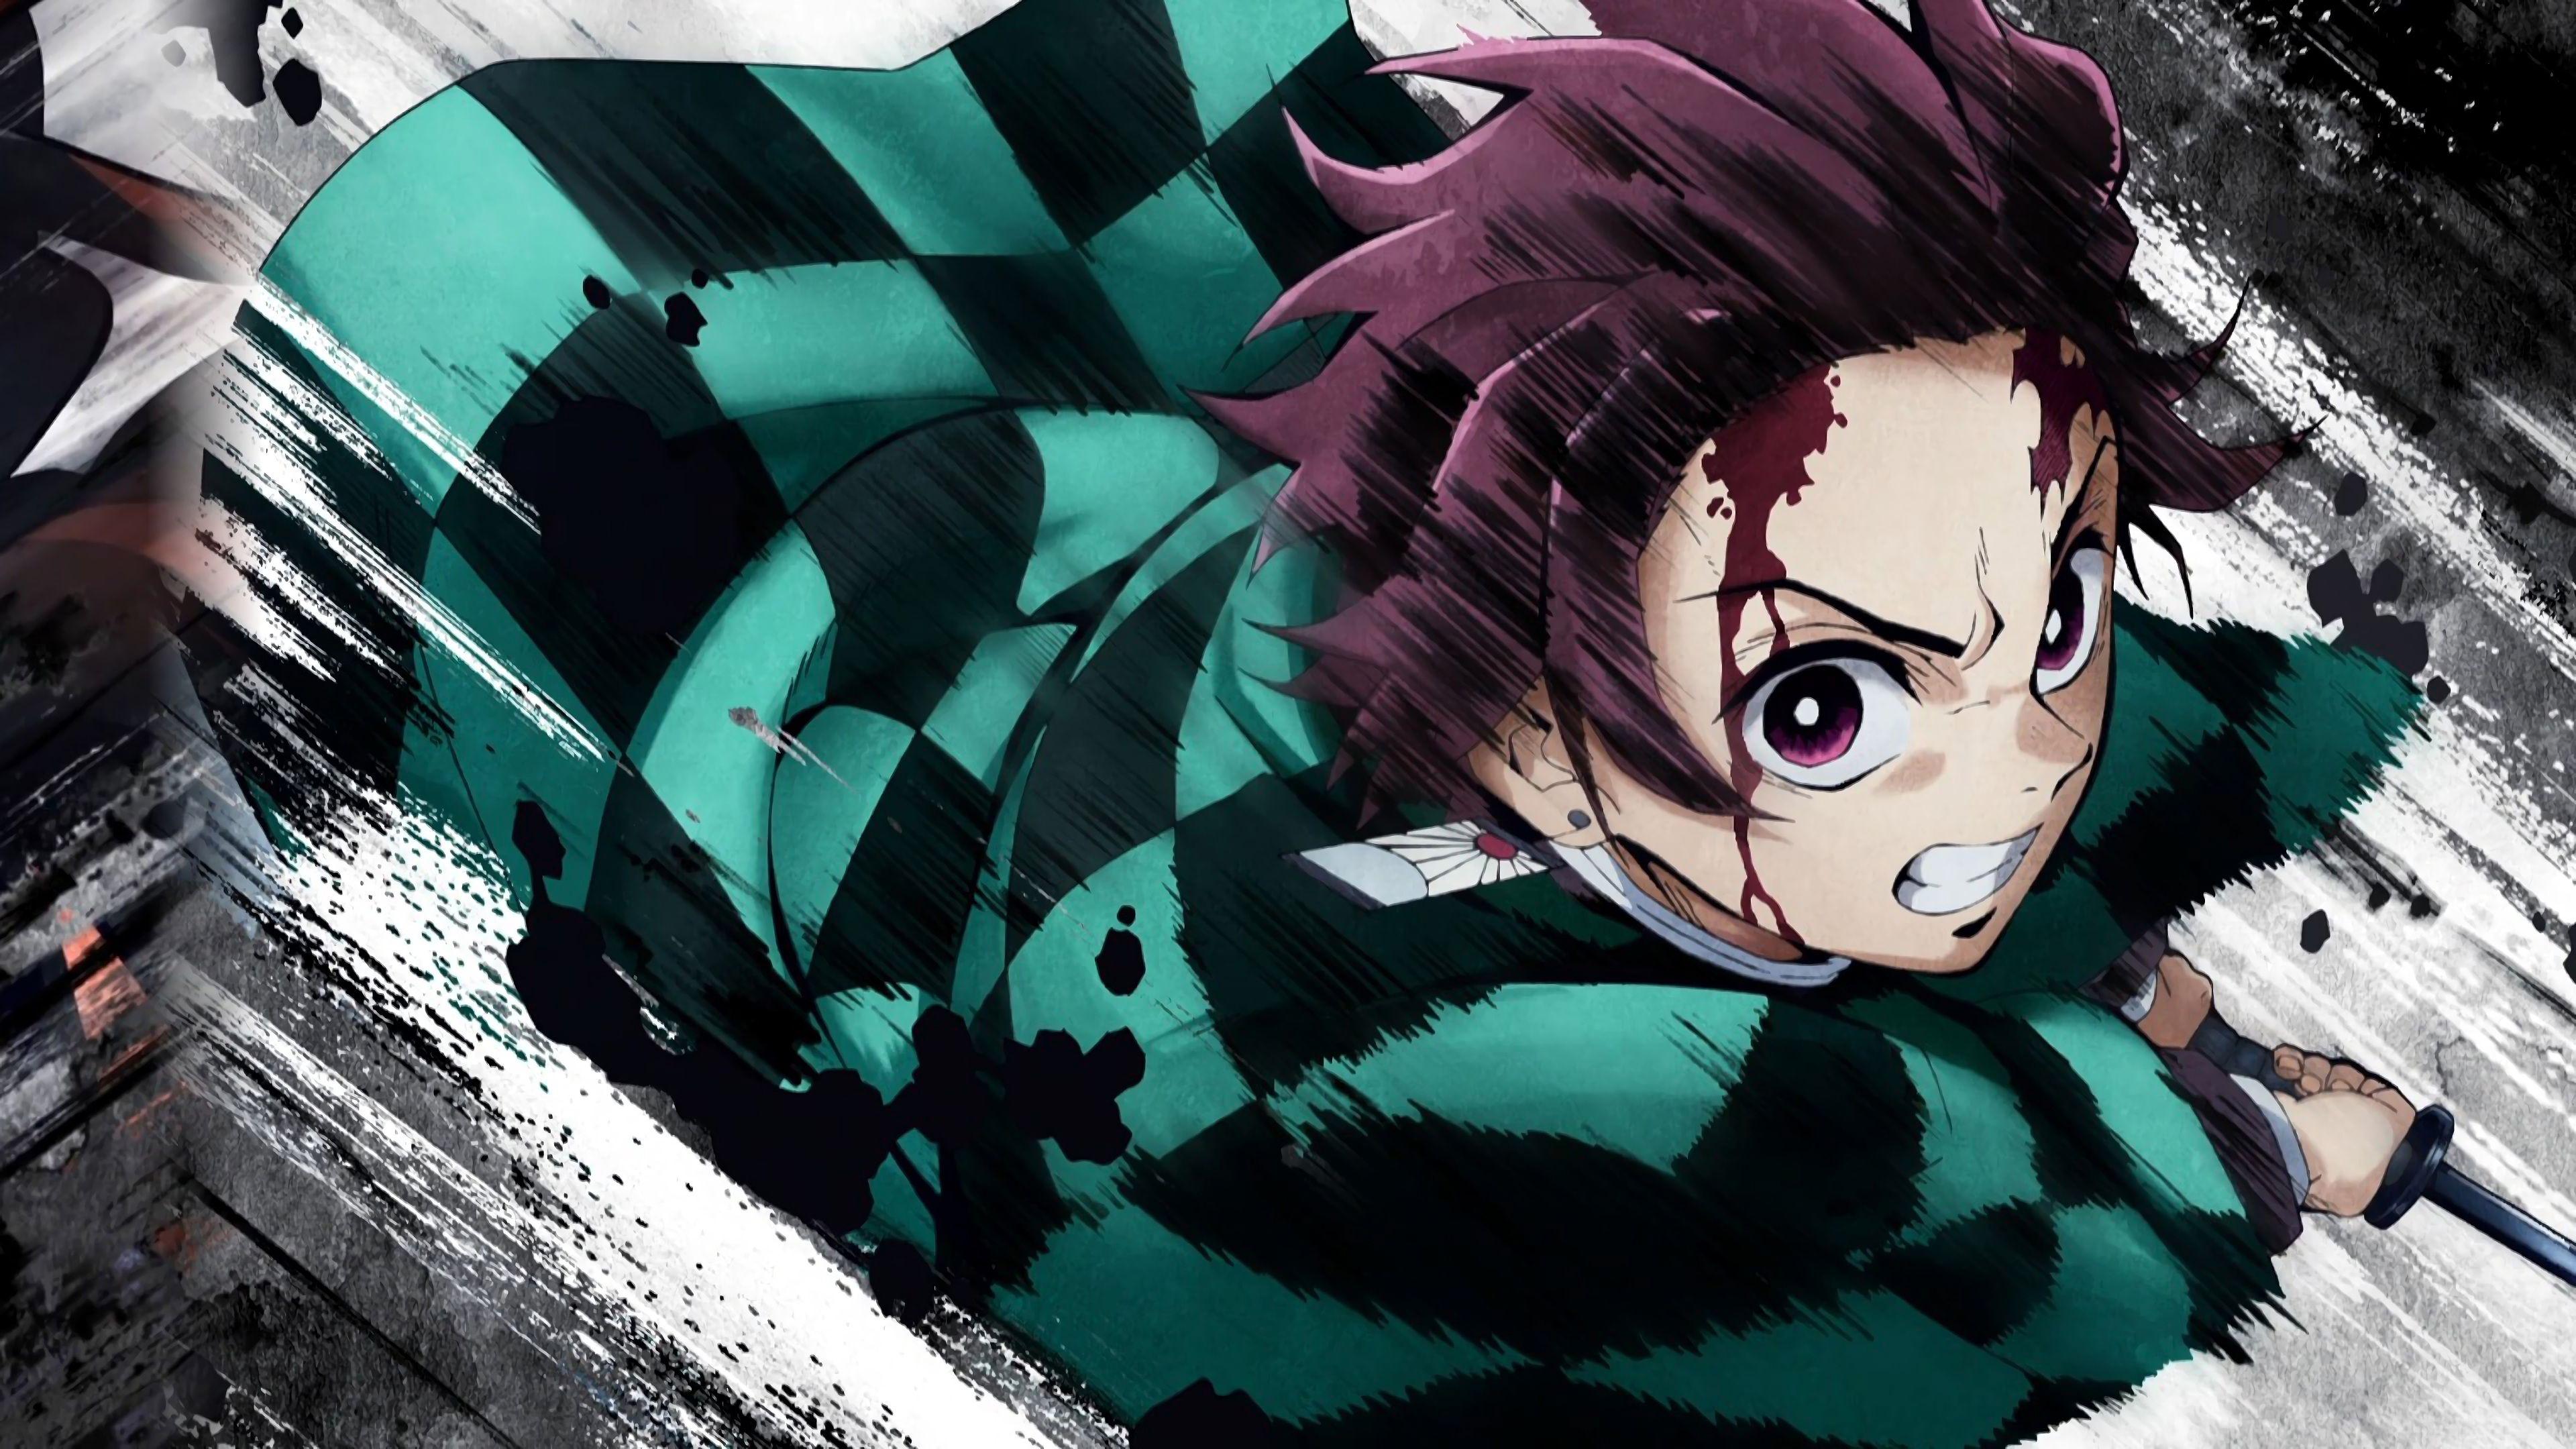 Kimetsu No Yaiba Wallpaper Hd Pc Menina anime Anime Animes br 3840x2160